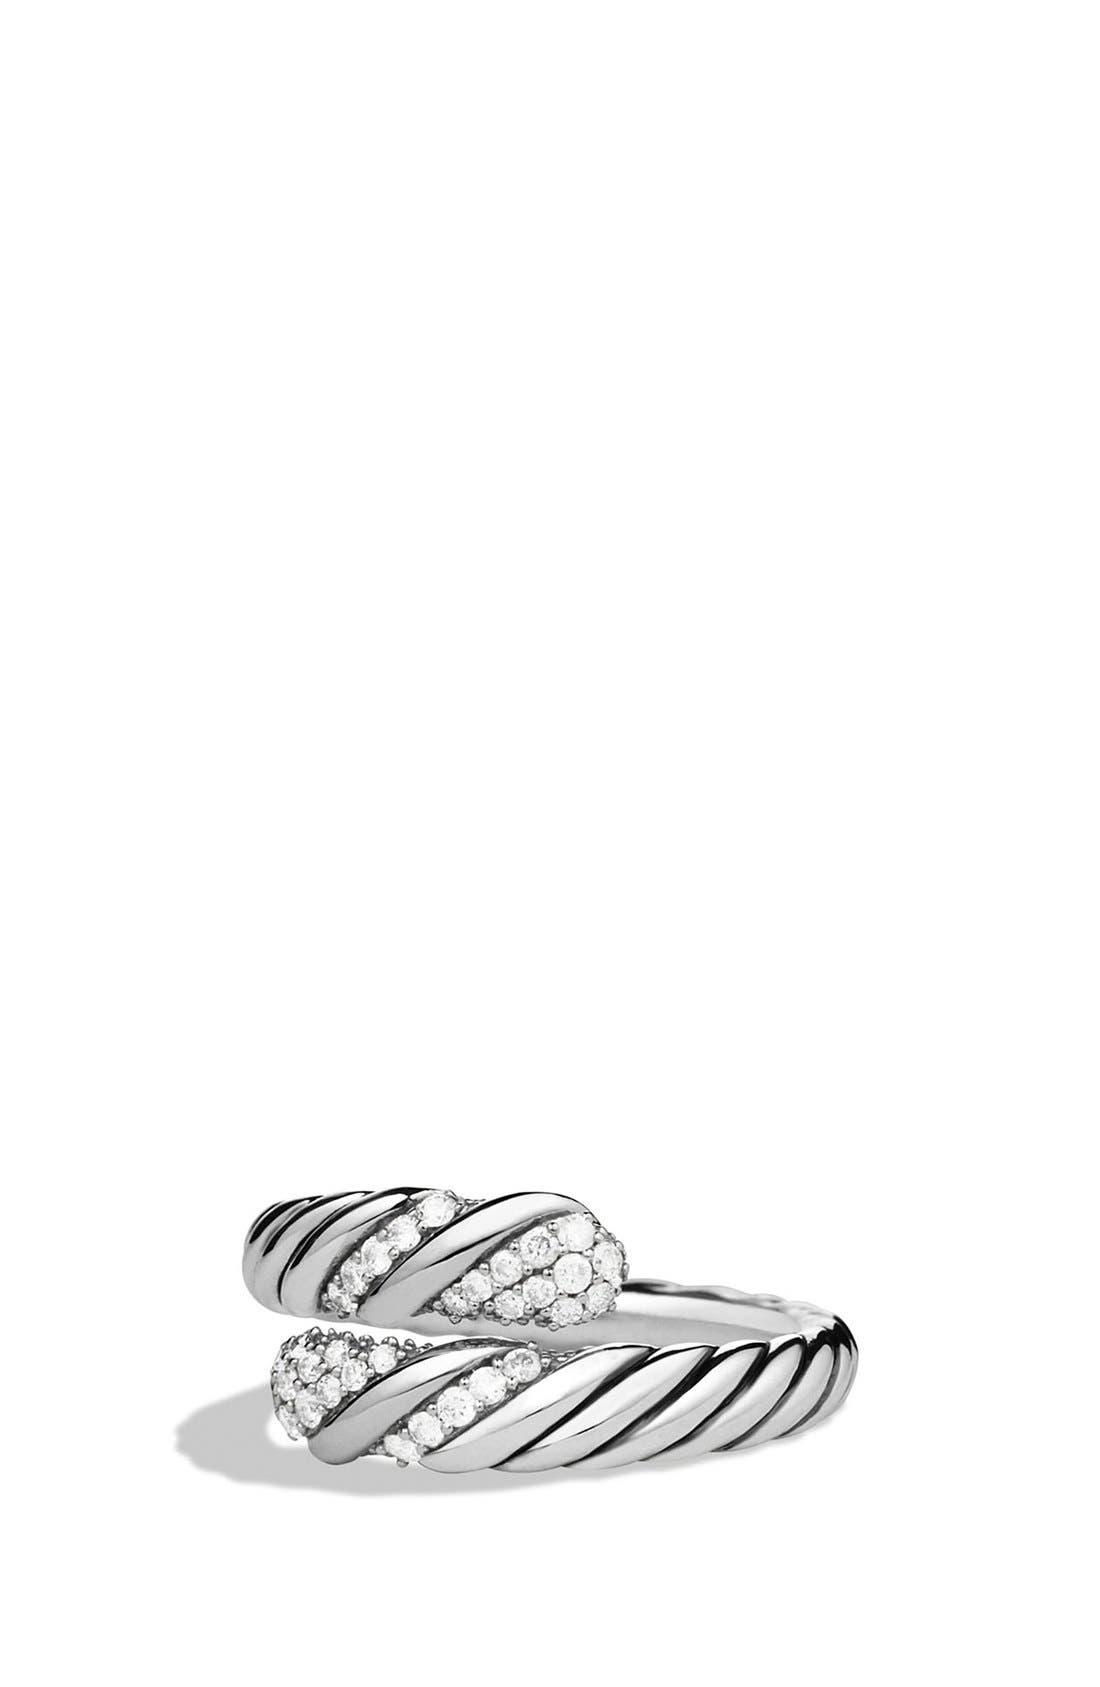 David Yurman 'Willow' Open Single Row Ring with Diamonds